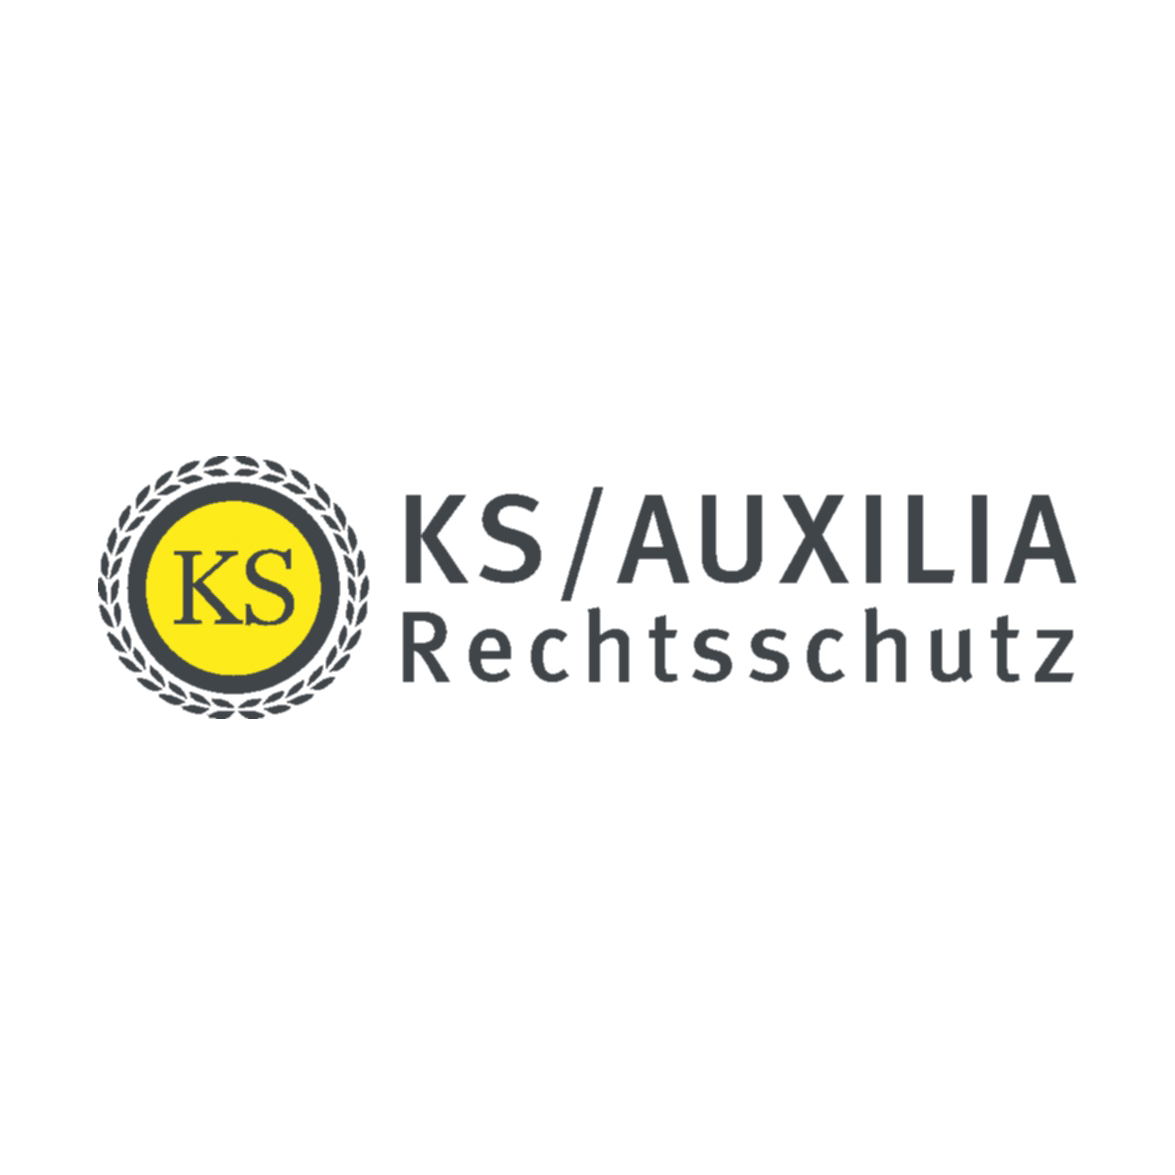 KS / AUXILIA Rechtsschutz